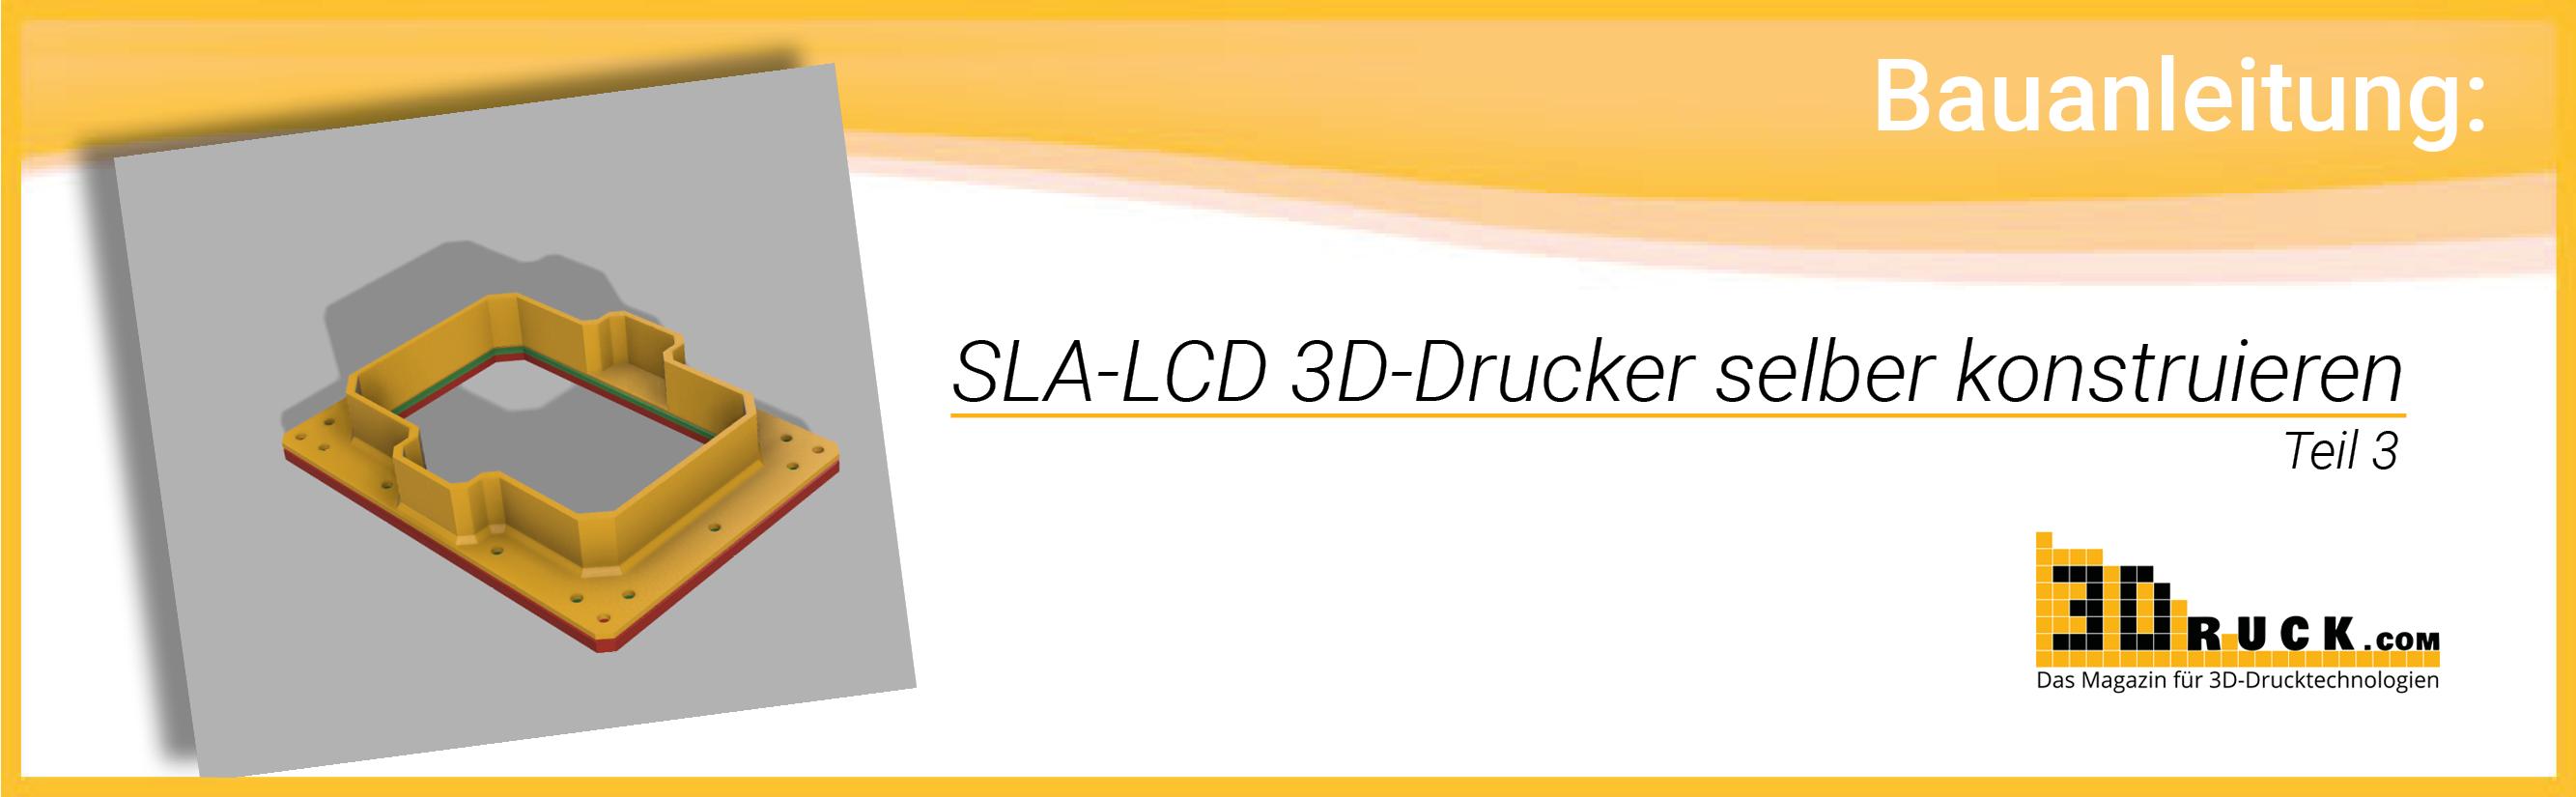 bauanleitung sla lcd 3d drucker selber konstruieren teil 3. Black Bedroom Furniture Sets. Home Design Ideas